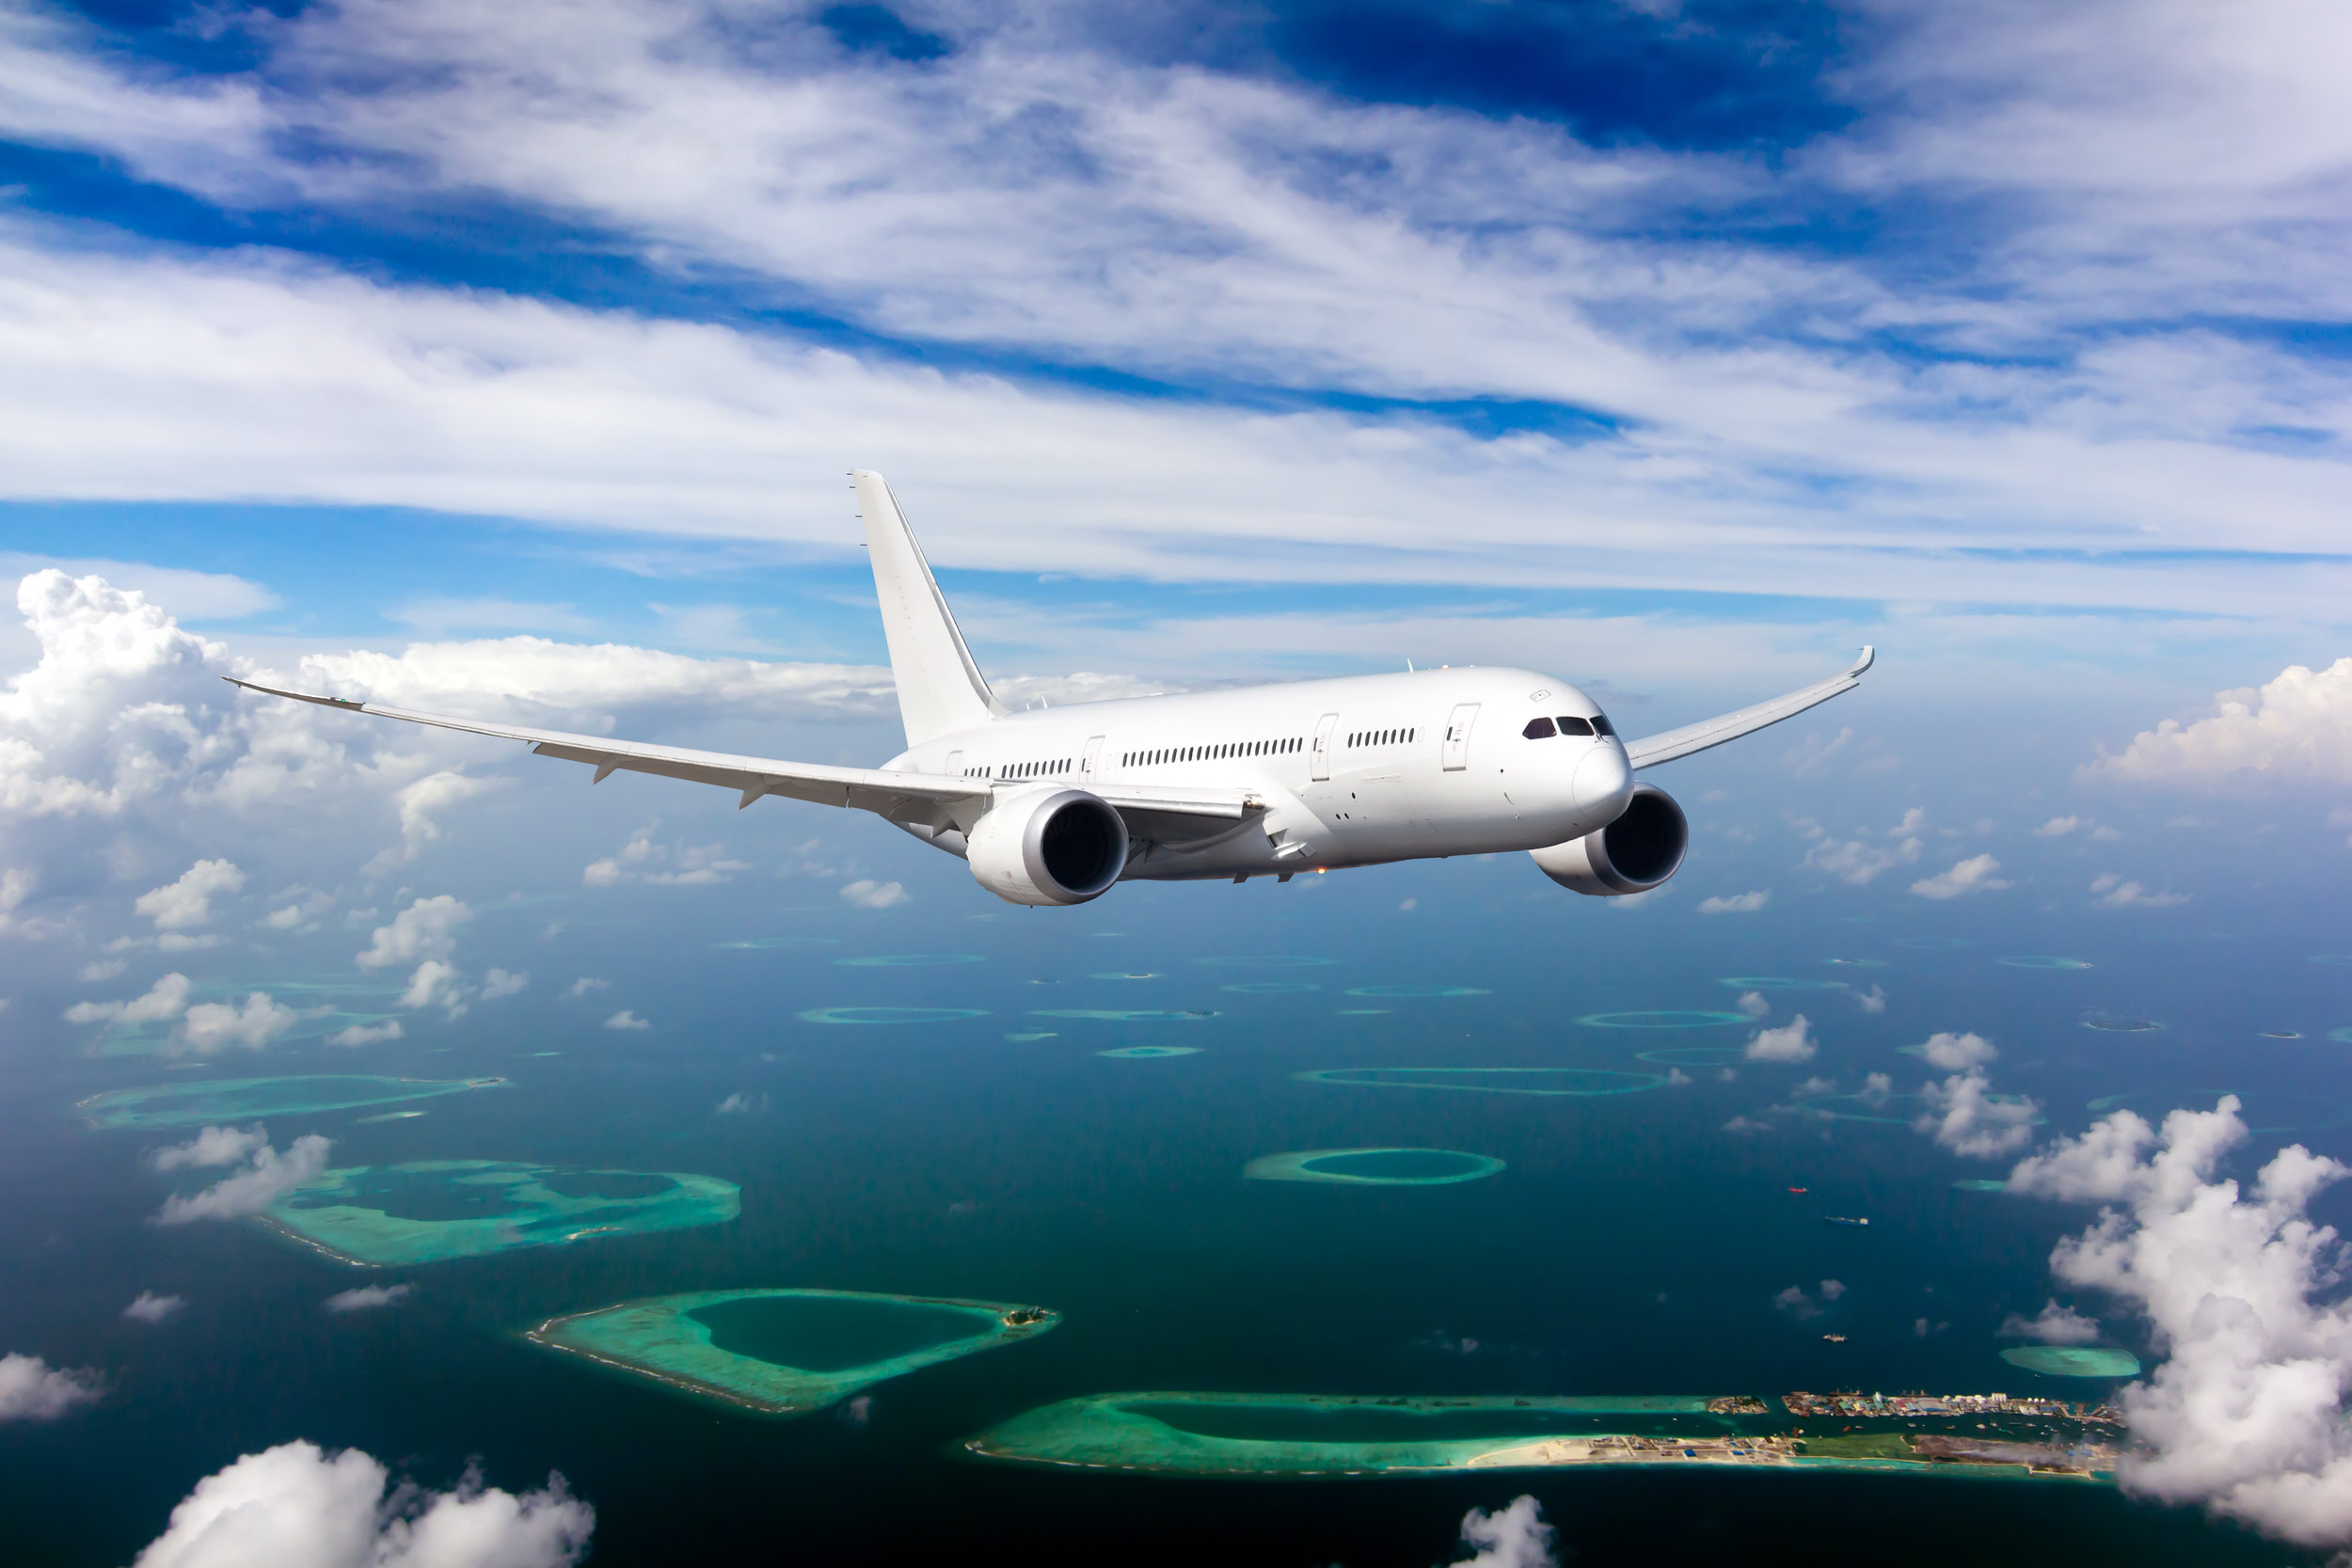 invite-to-paradise-maldives-specialists-experts-travel-agent-tour-operator-transfer-domestic-flight-maldivian-air.jpg